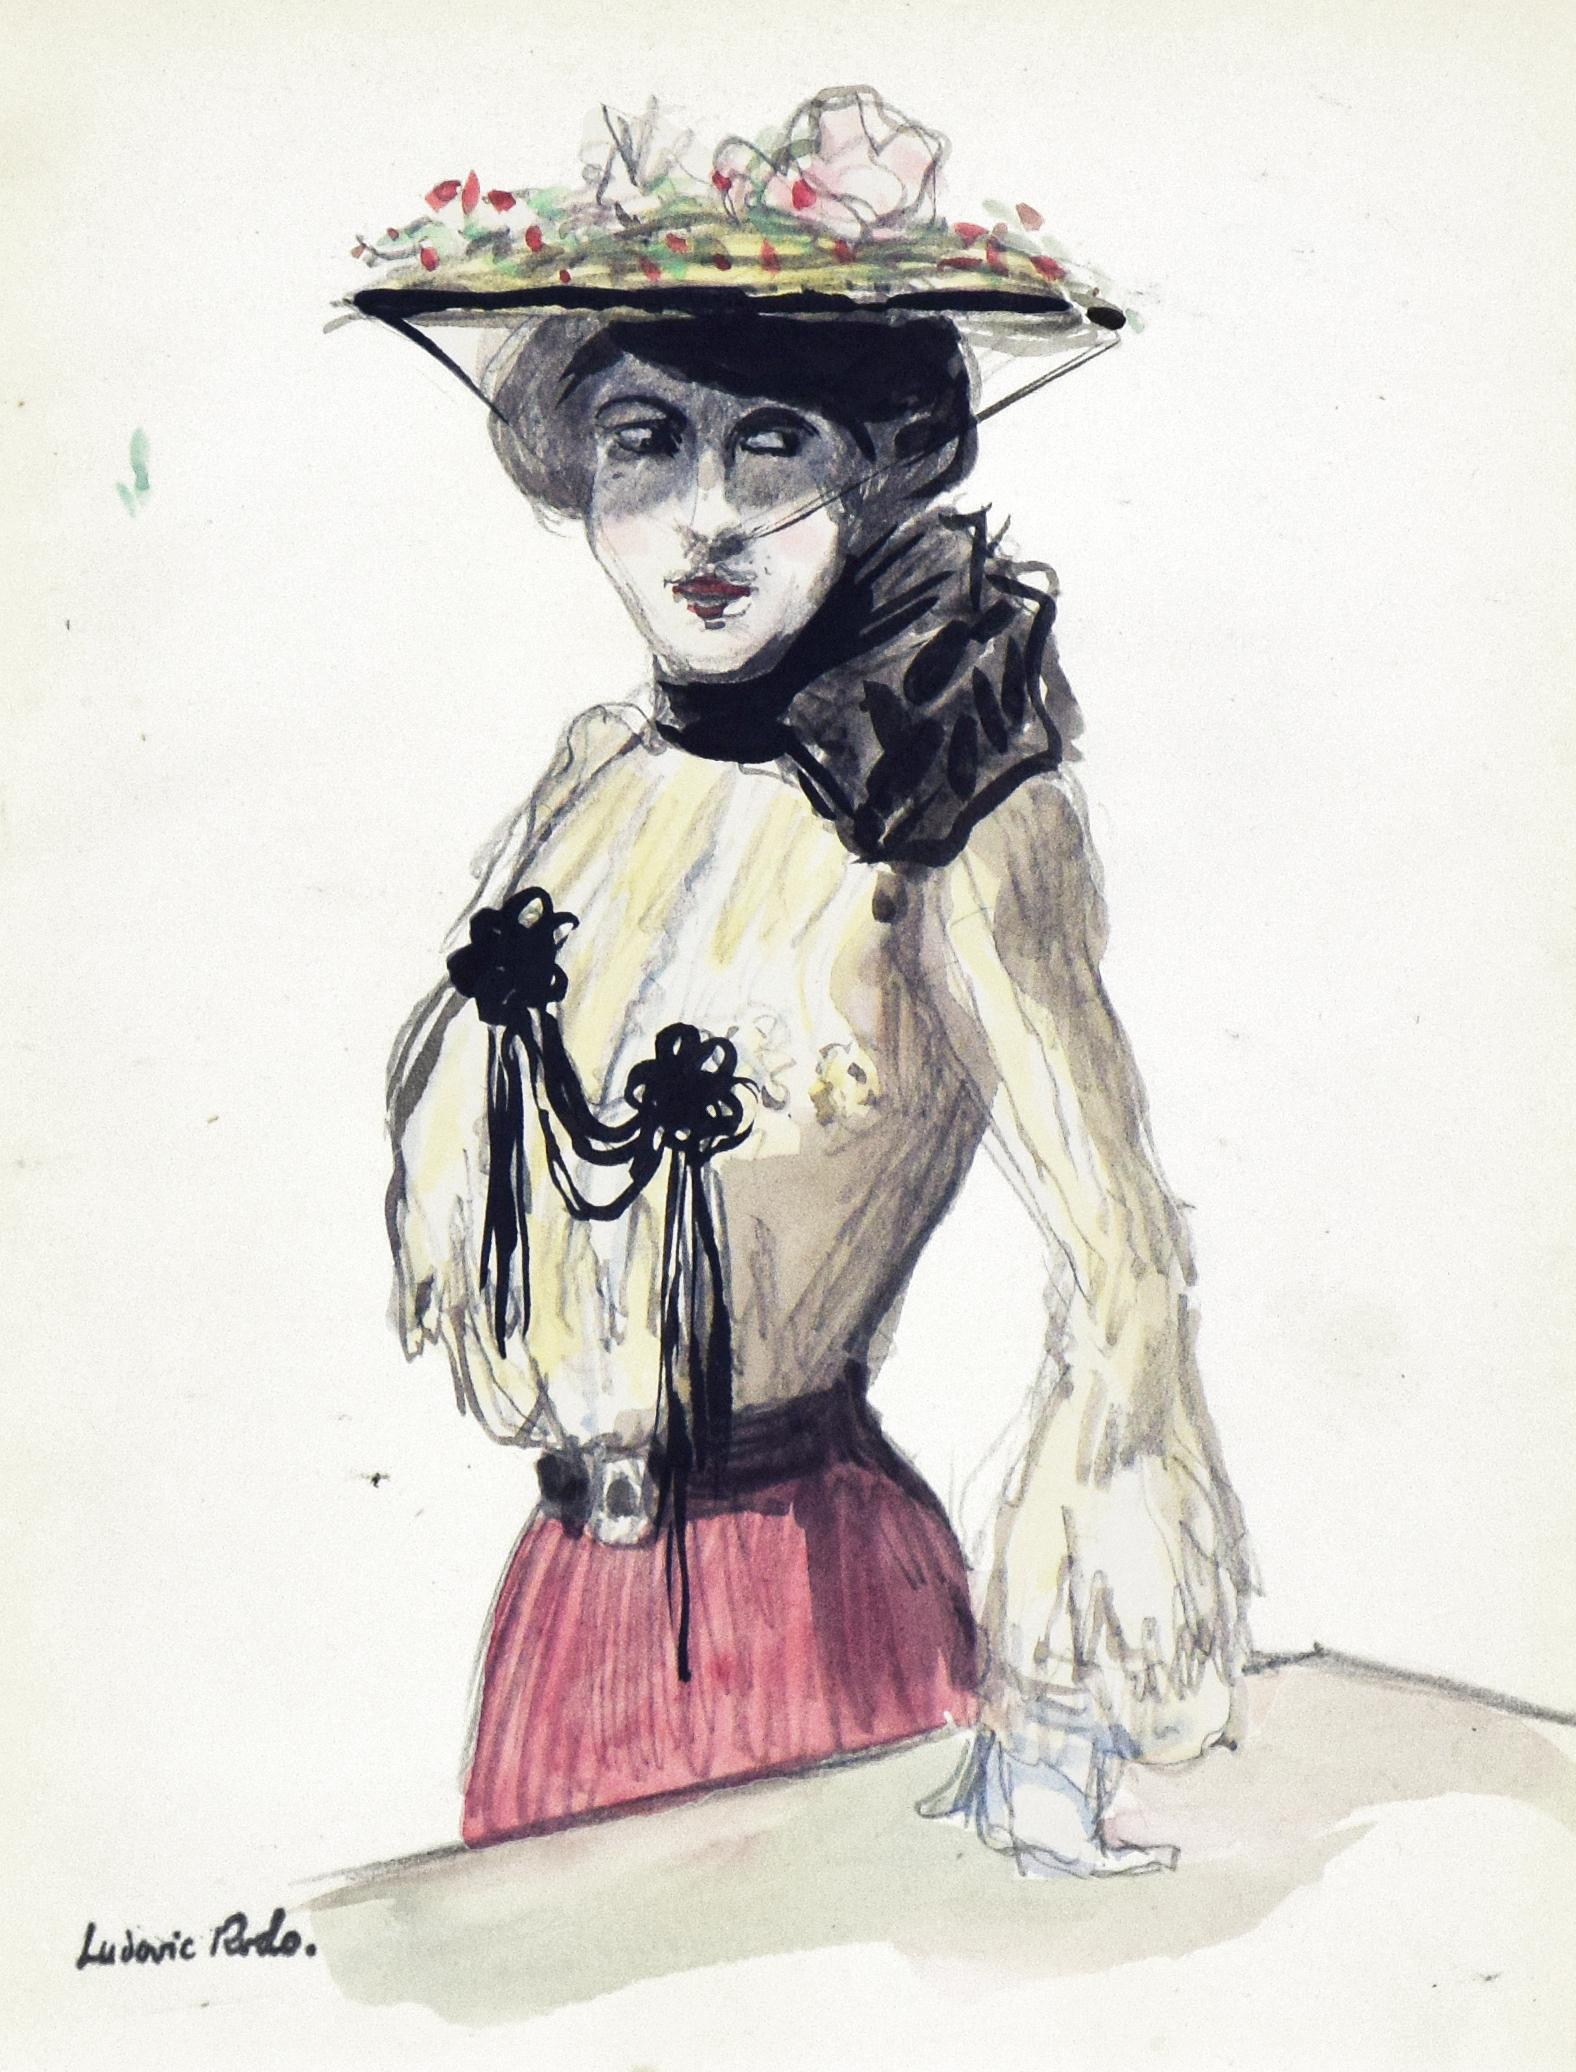 La Parisienne by Ludovic-Rodo Pissarro - Watercolour, Portrait, School of Paris